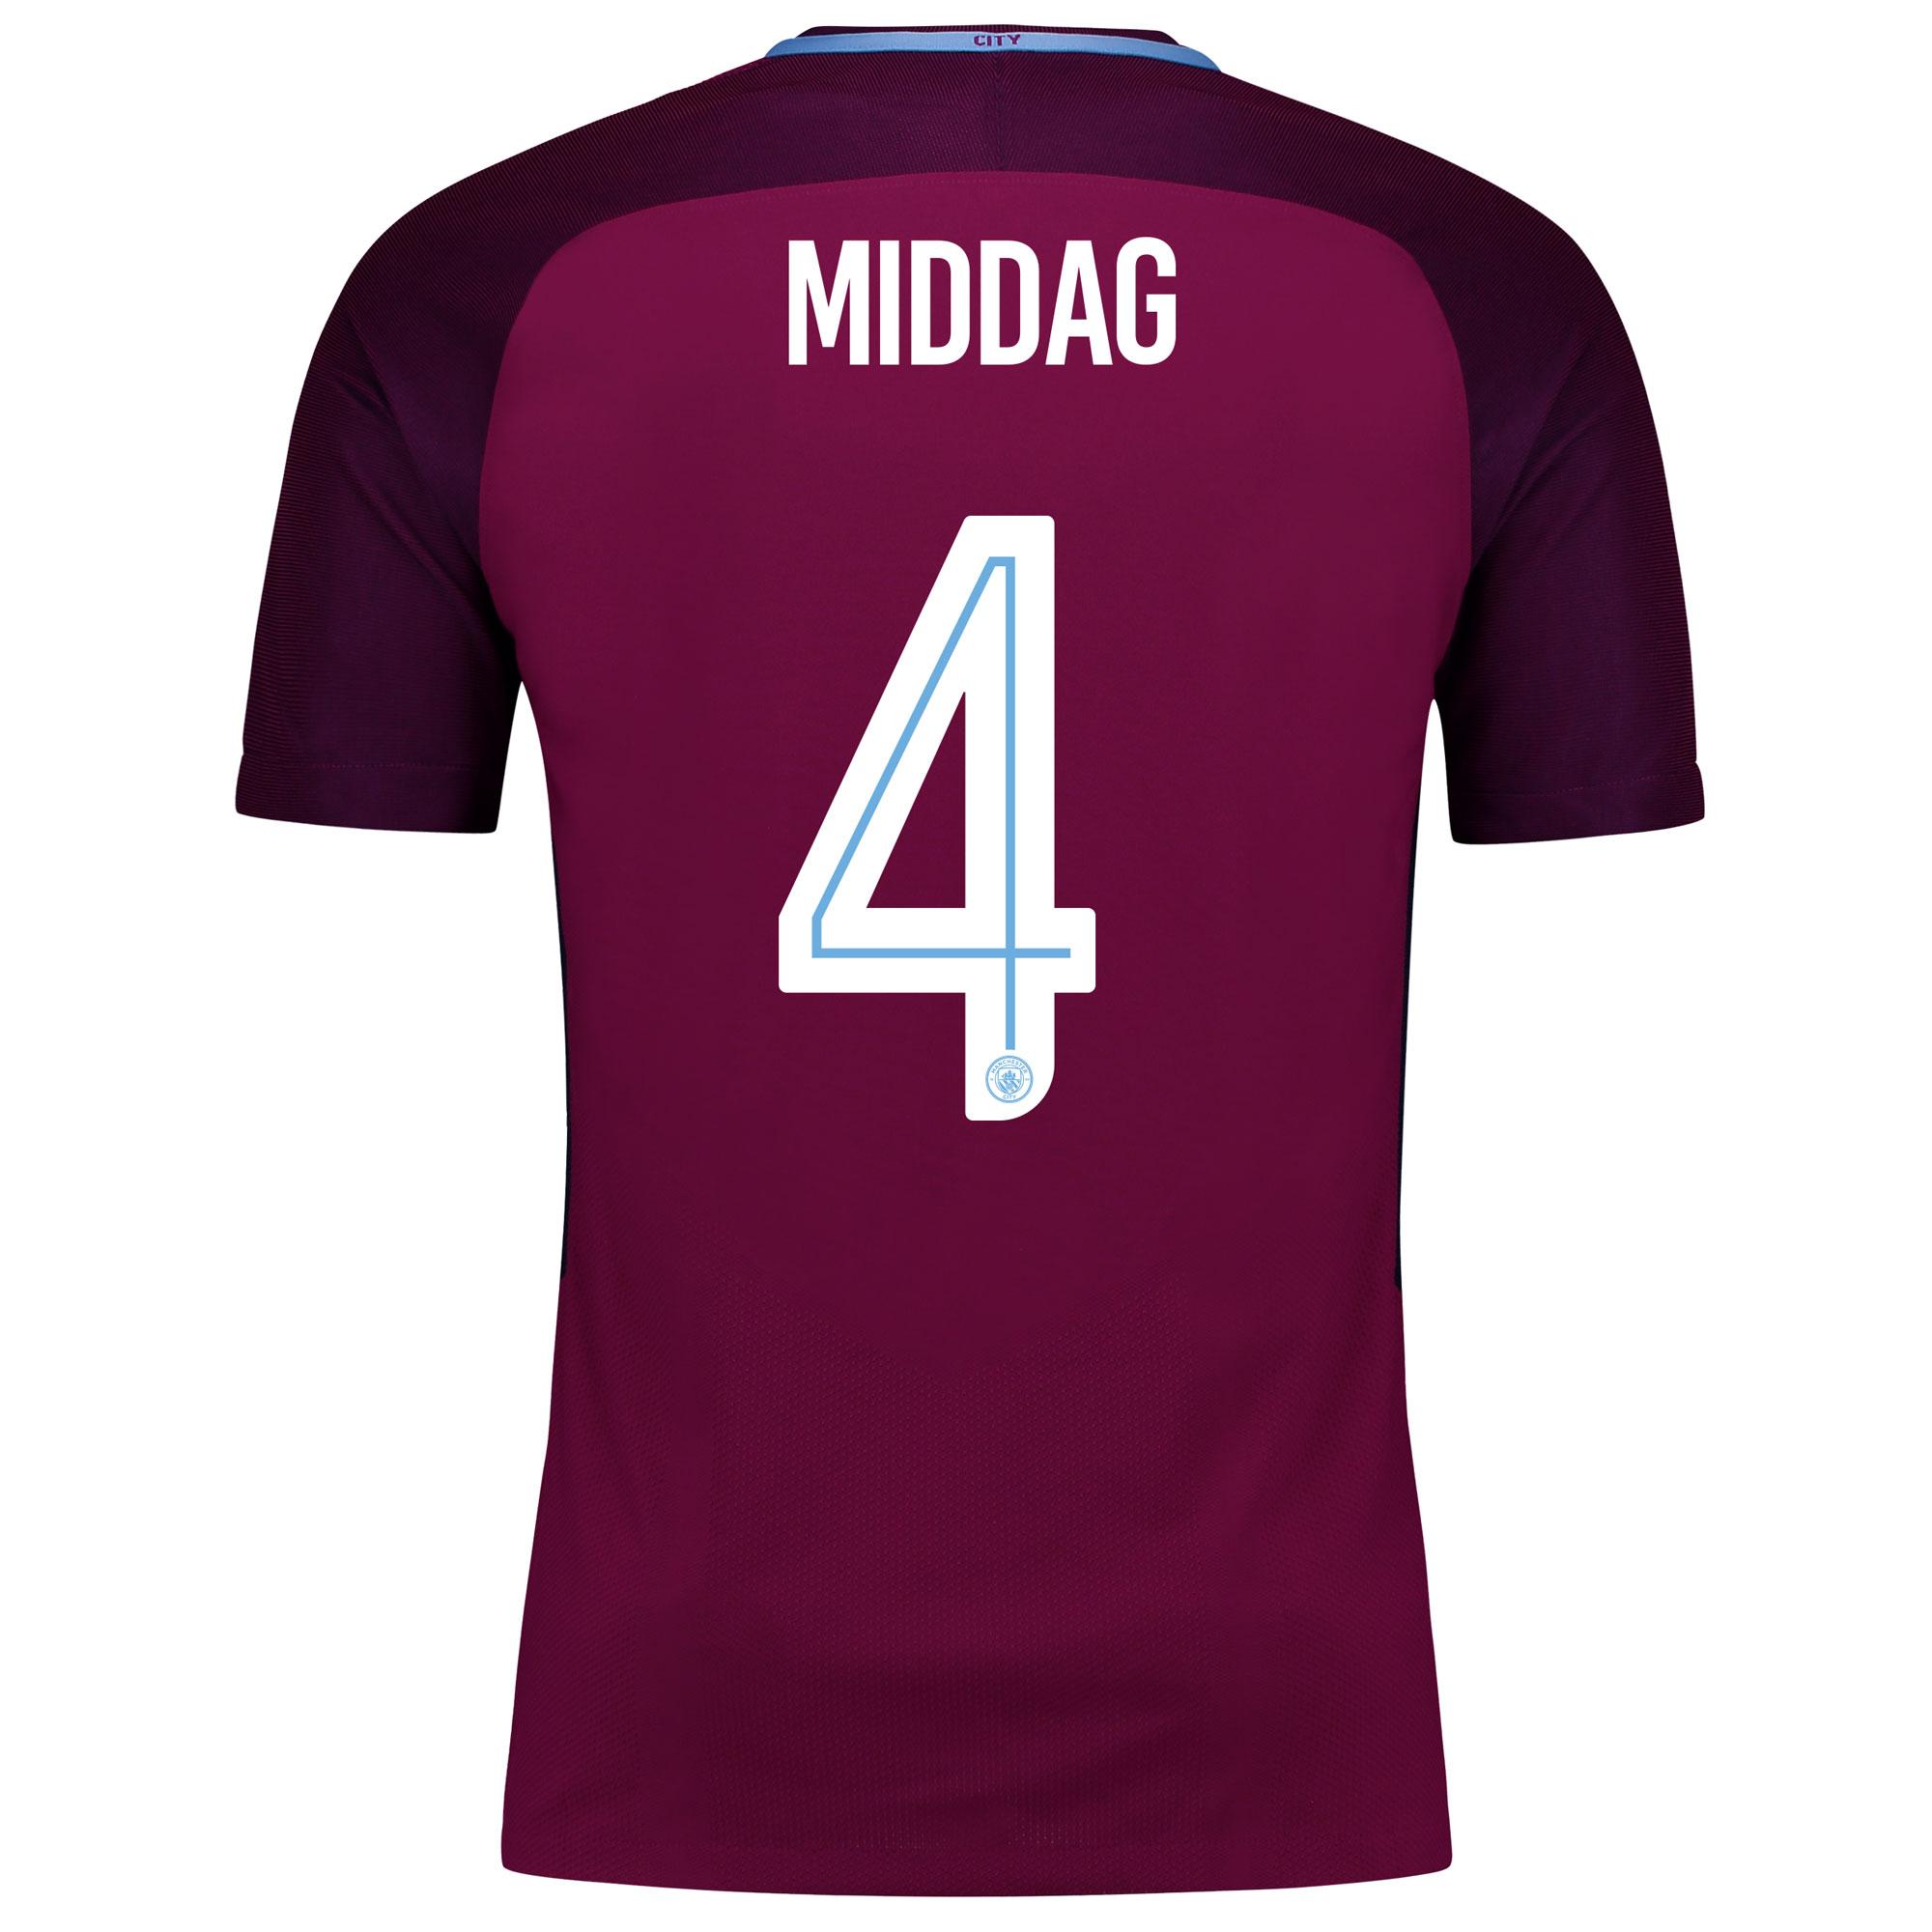 Manchester City Away Vapor Match Cup Shirt 2017-18 with Middag 4 print